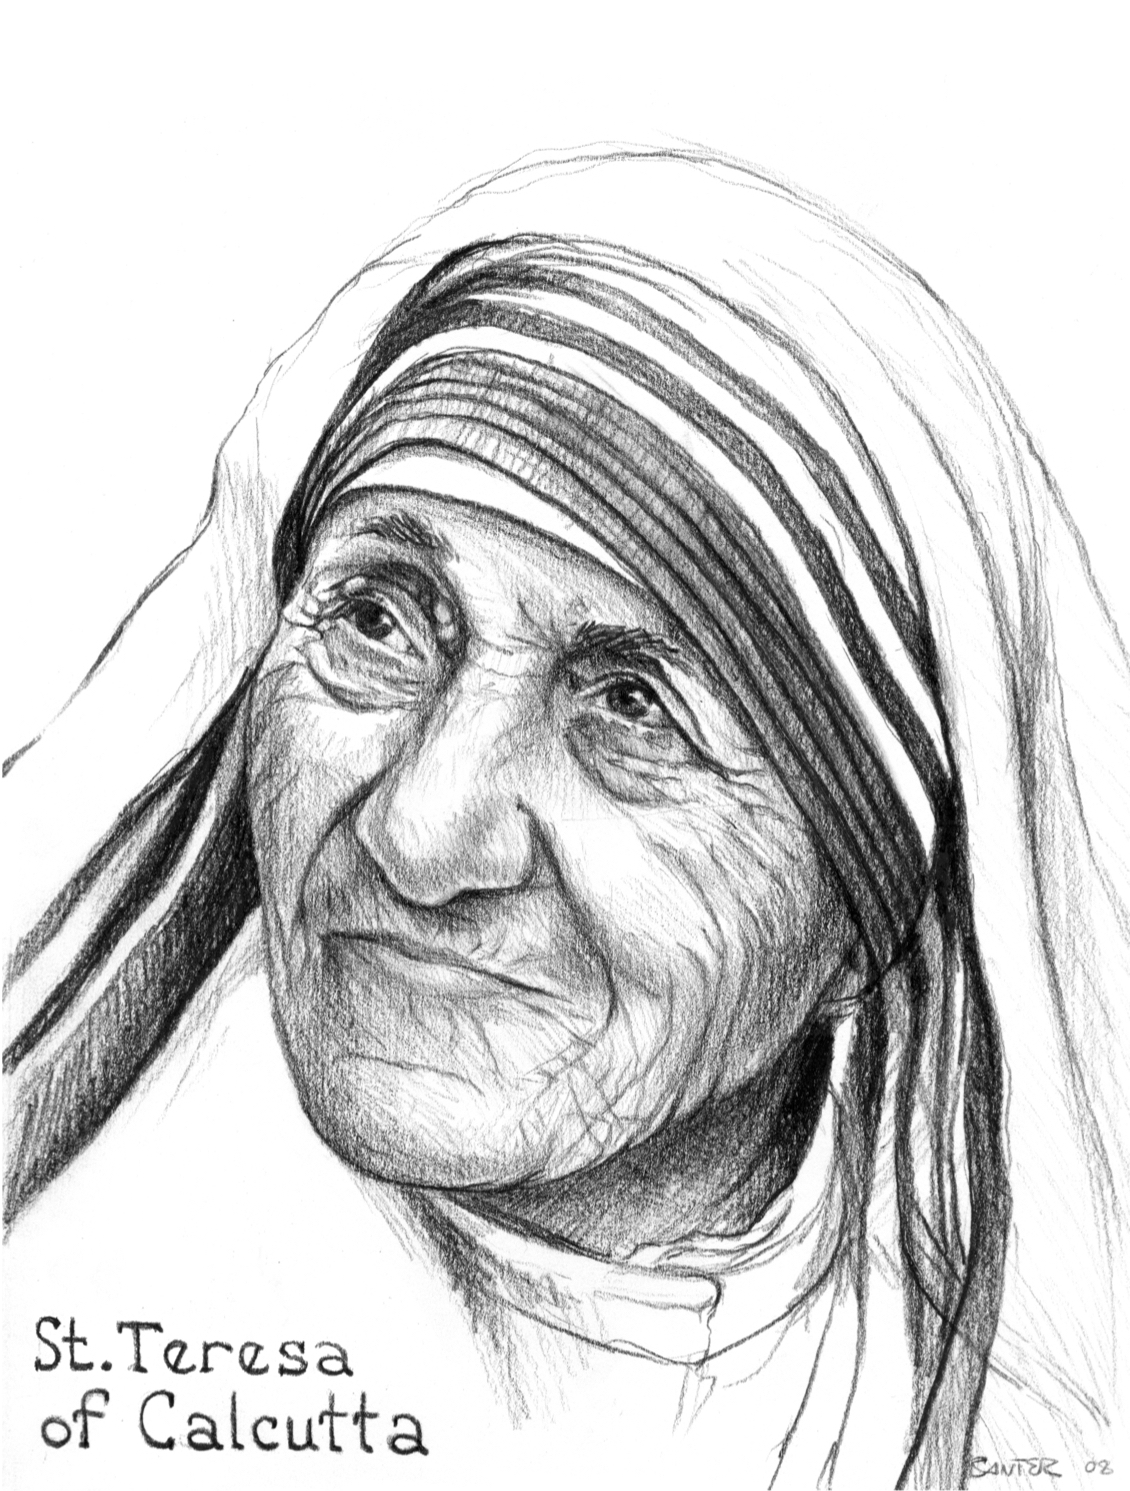 St. Teresa of Calcutta.jpg